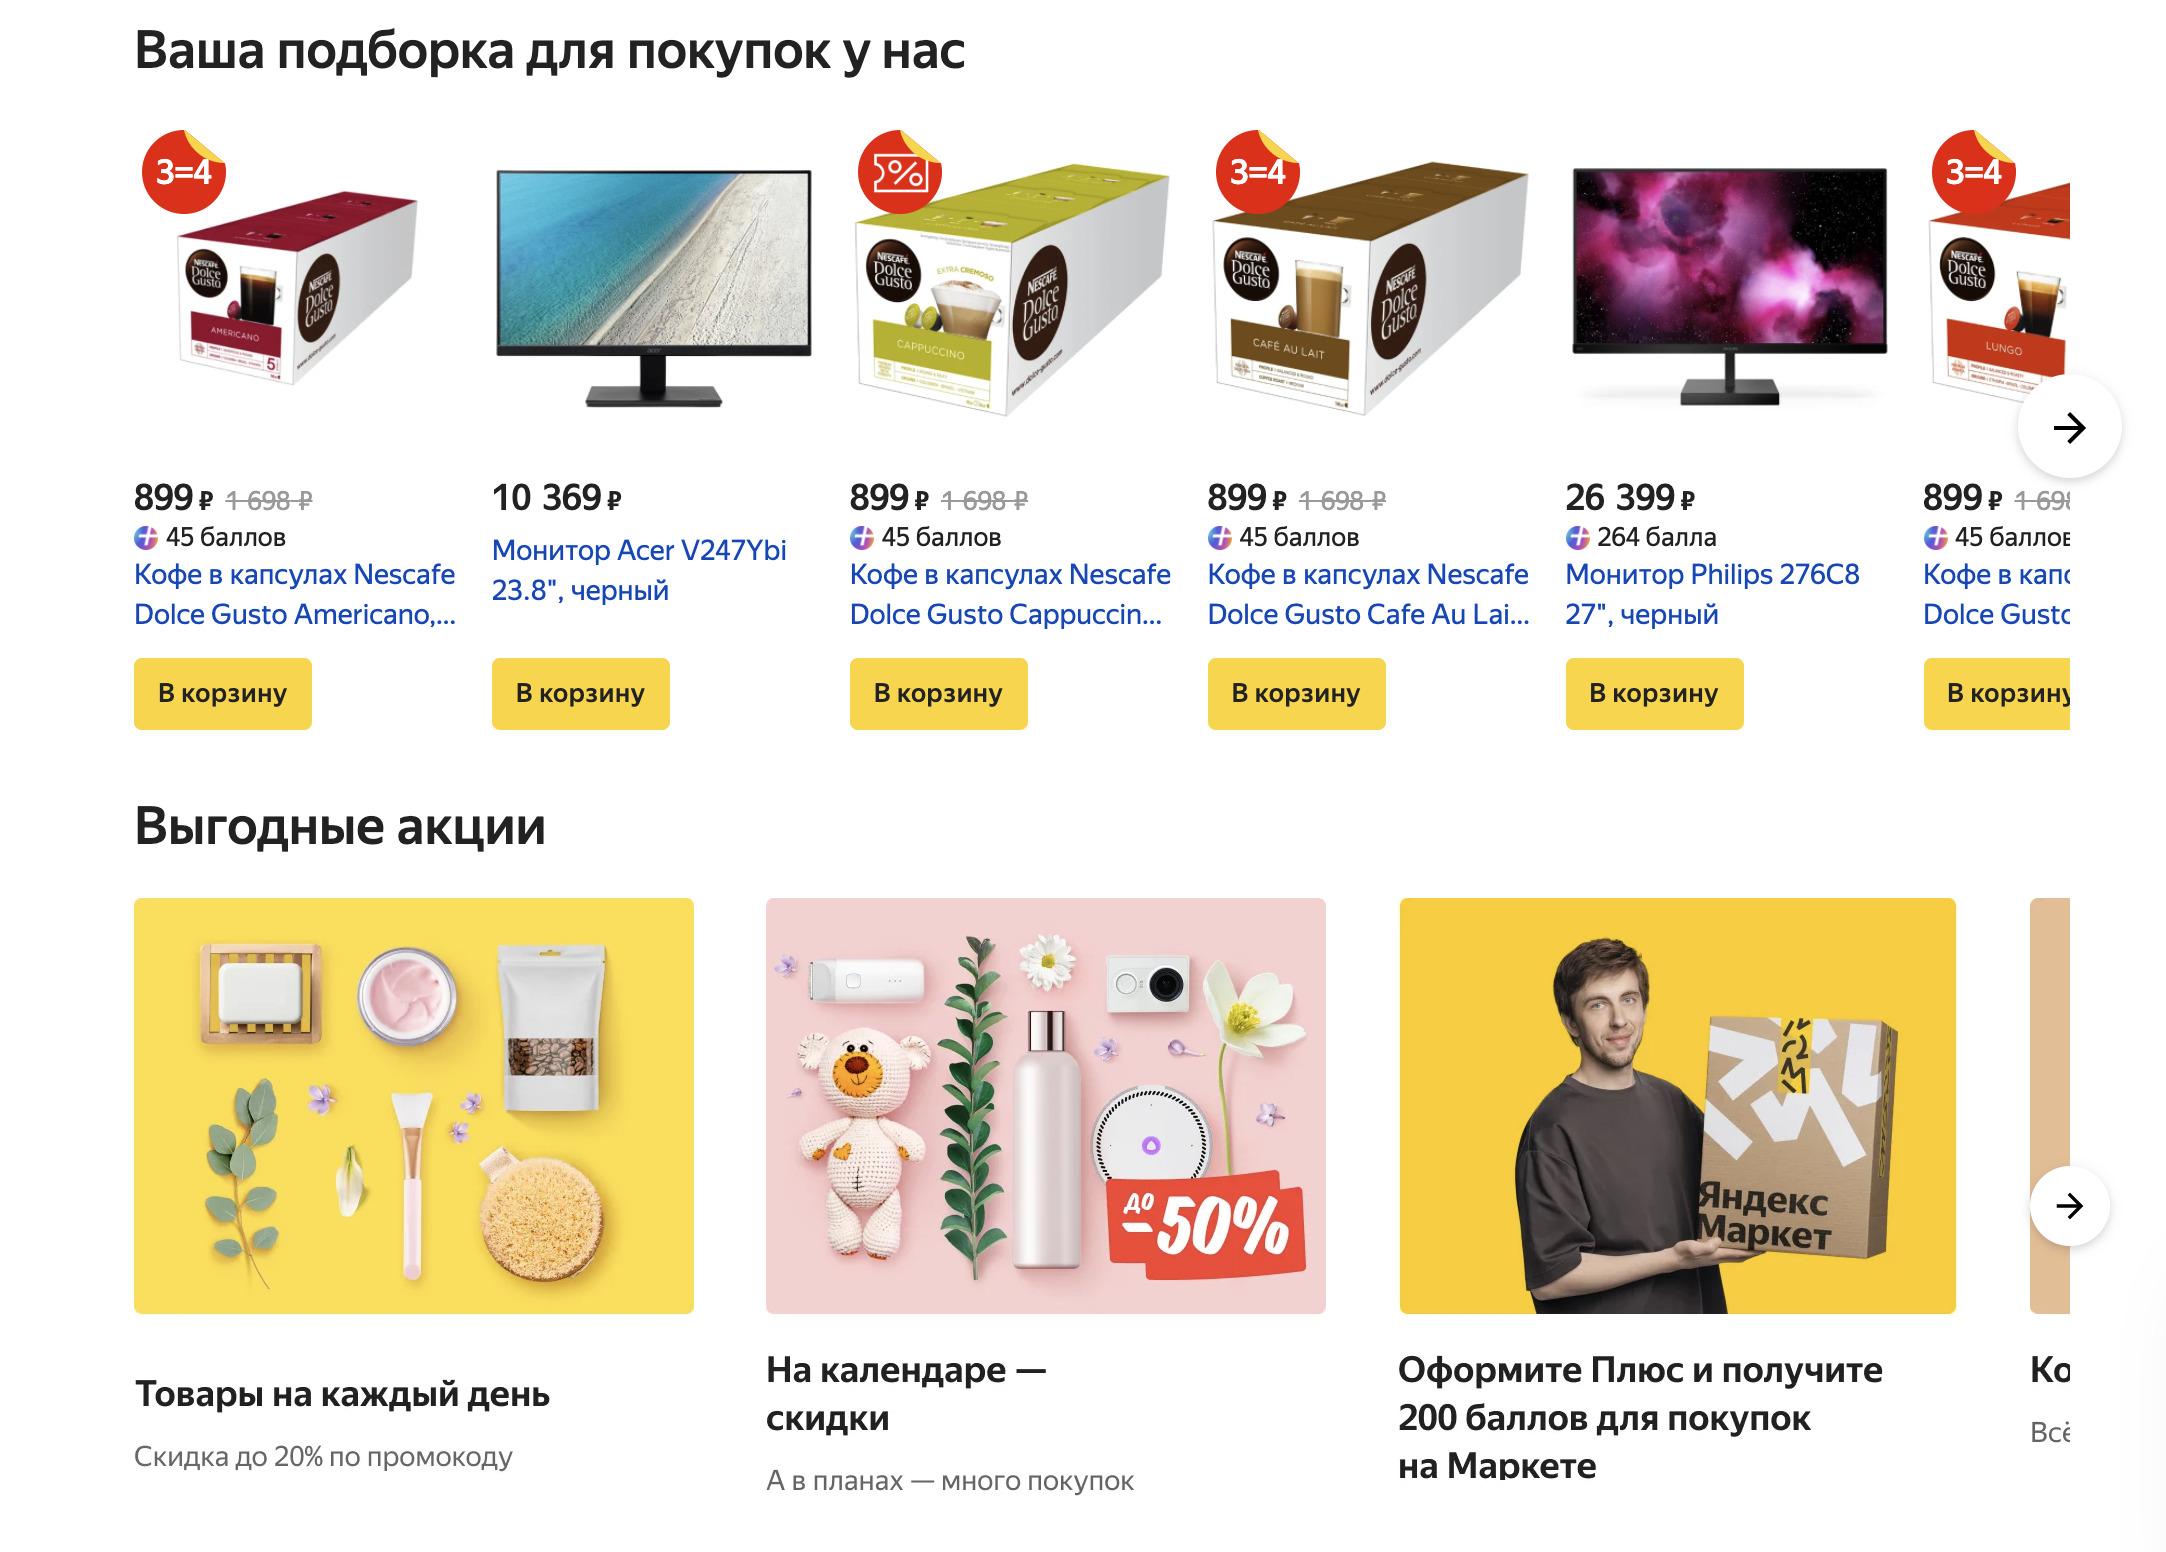 Доставка из Яндекс.Маркет в Находка, сроки, пункты выдачи, каталог